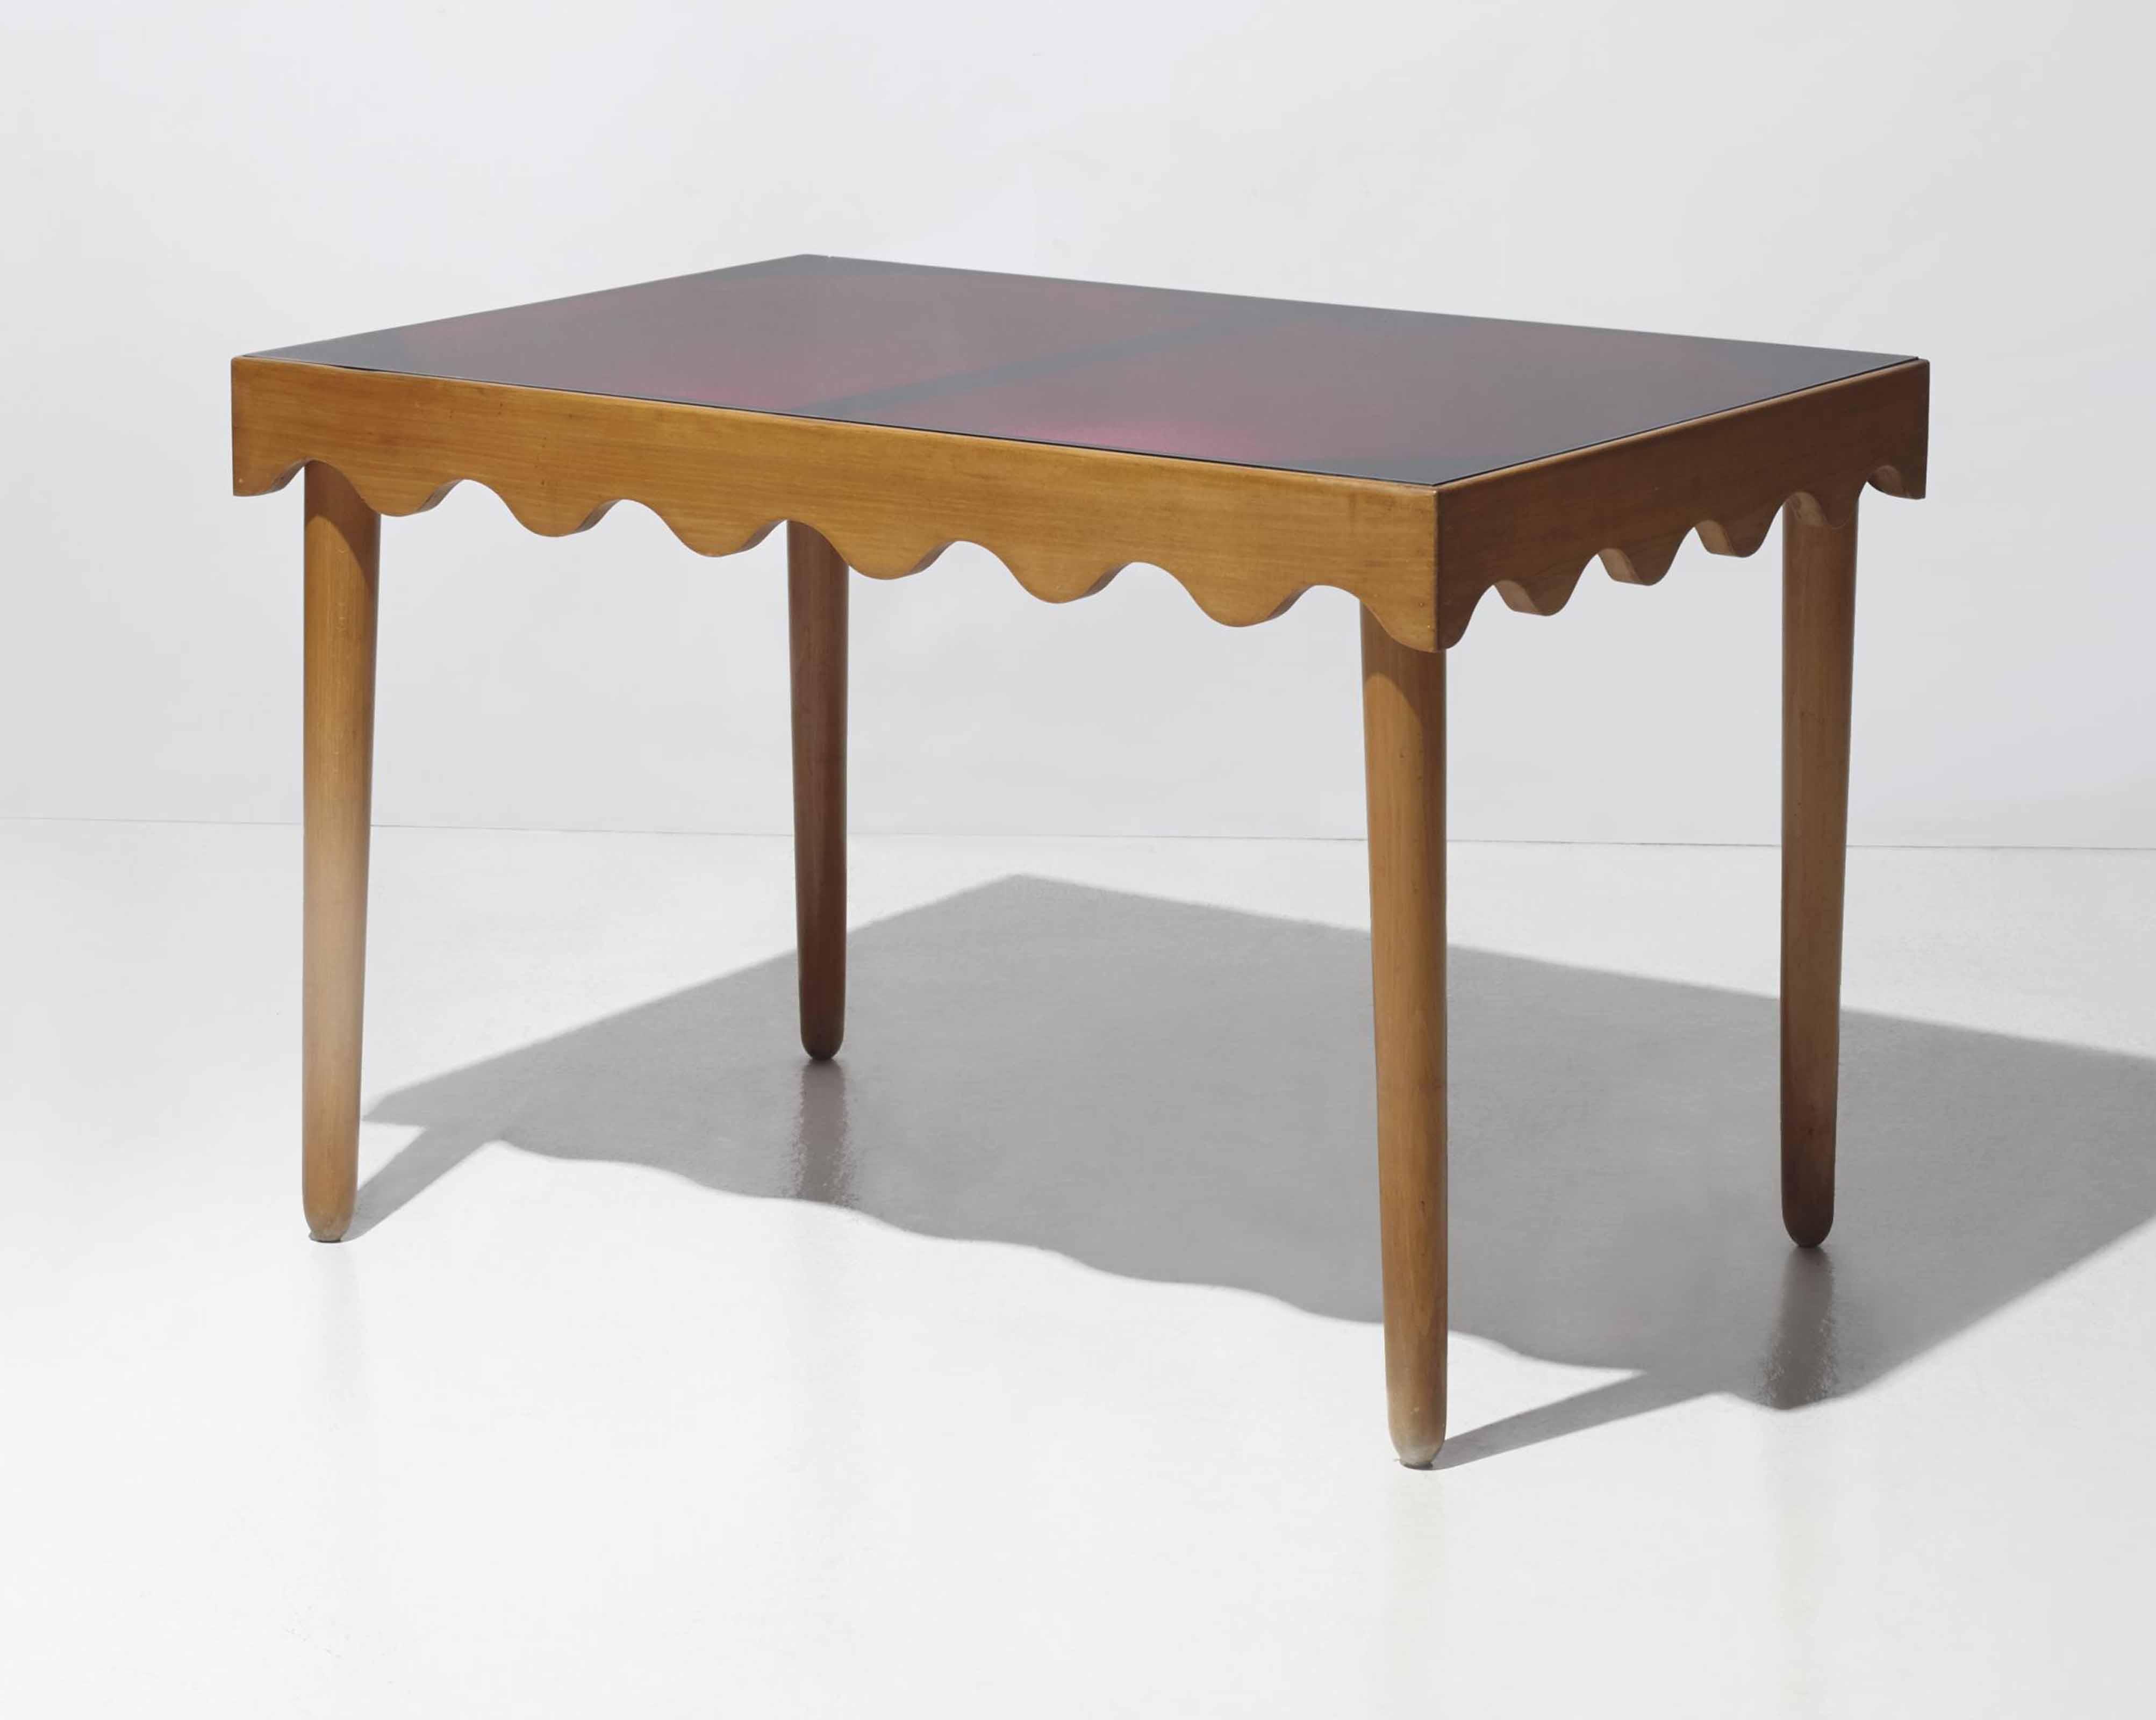 Jean roy re 1902 1981 table de salle manger ondulation for Table de salle a manger new york